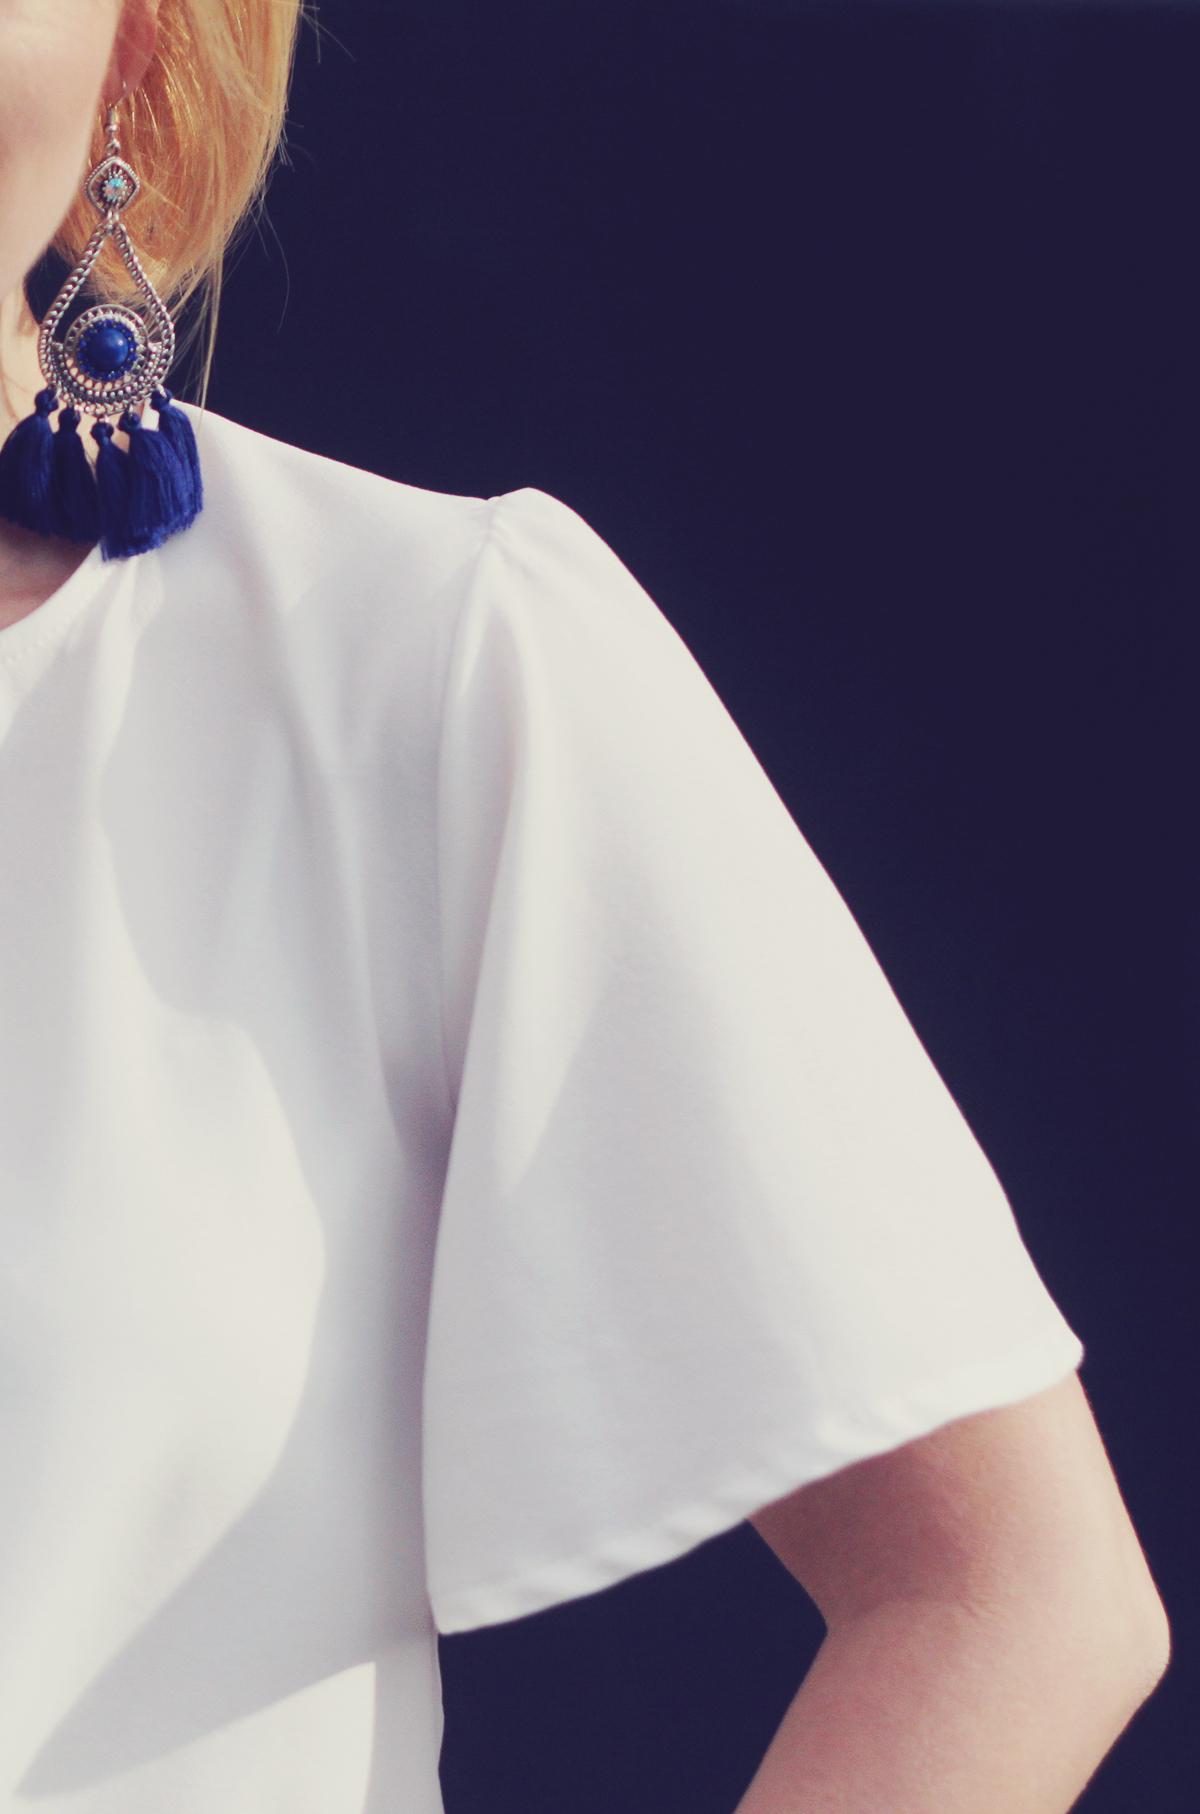 tassel earrings, white top